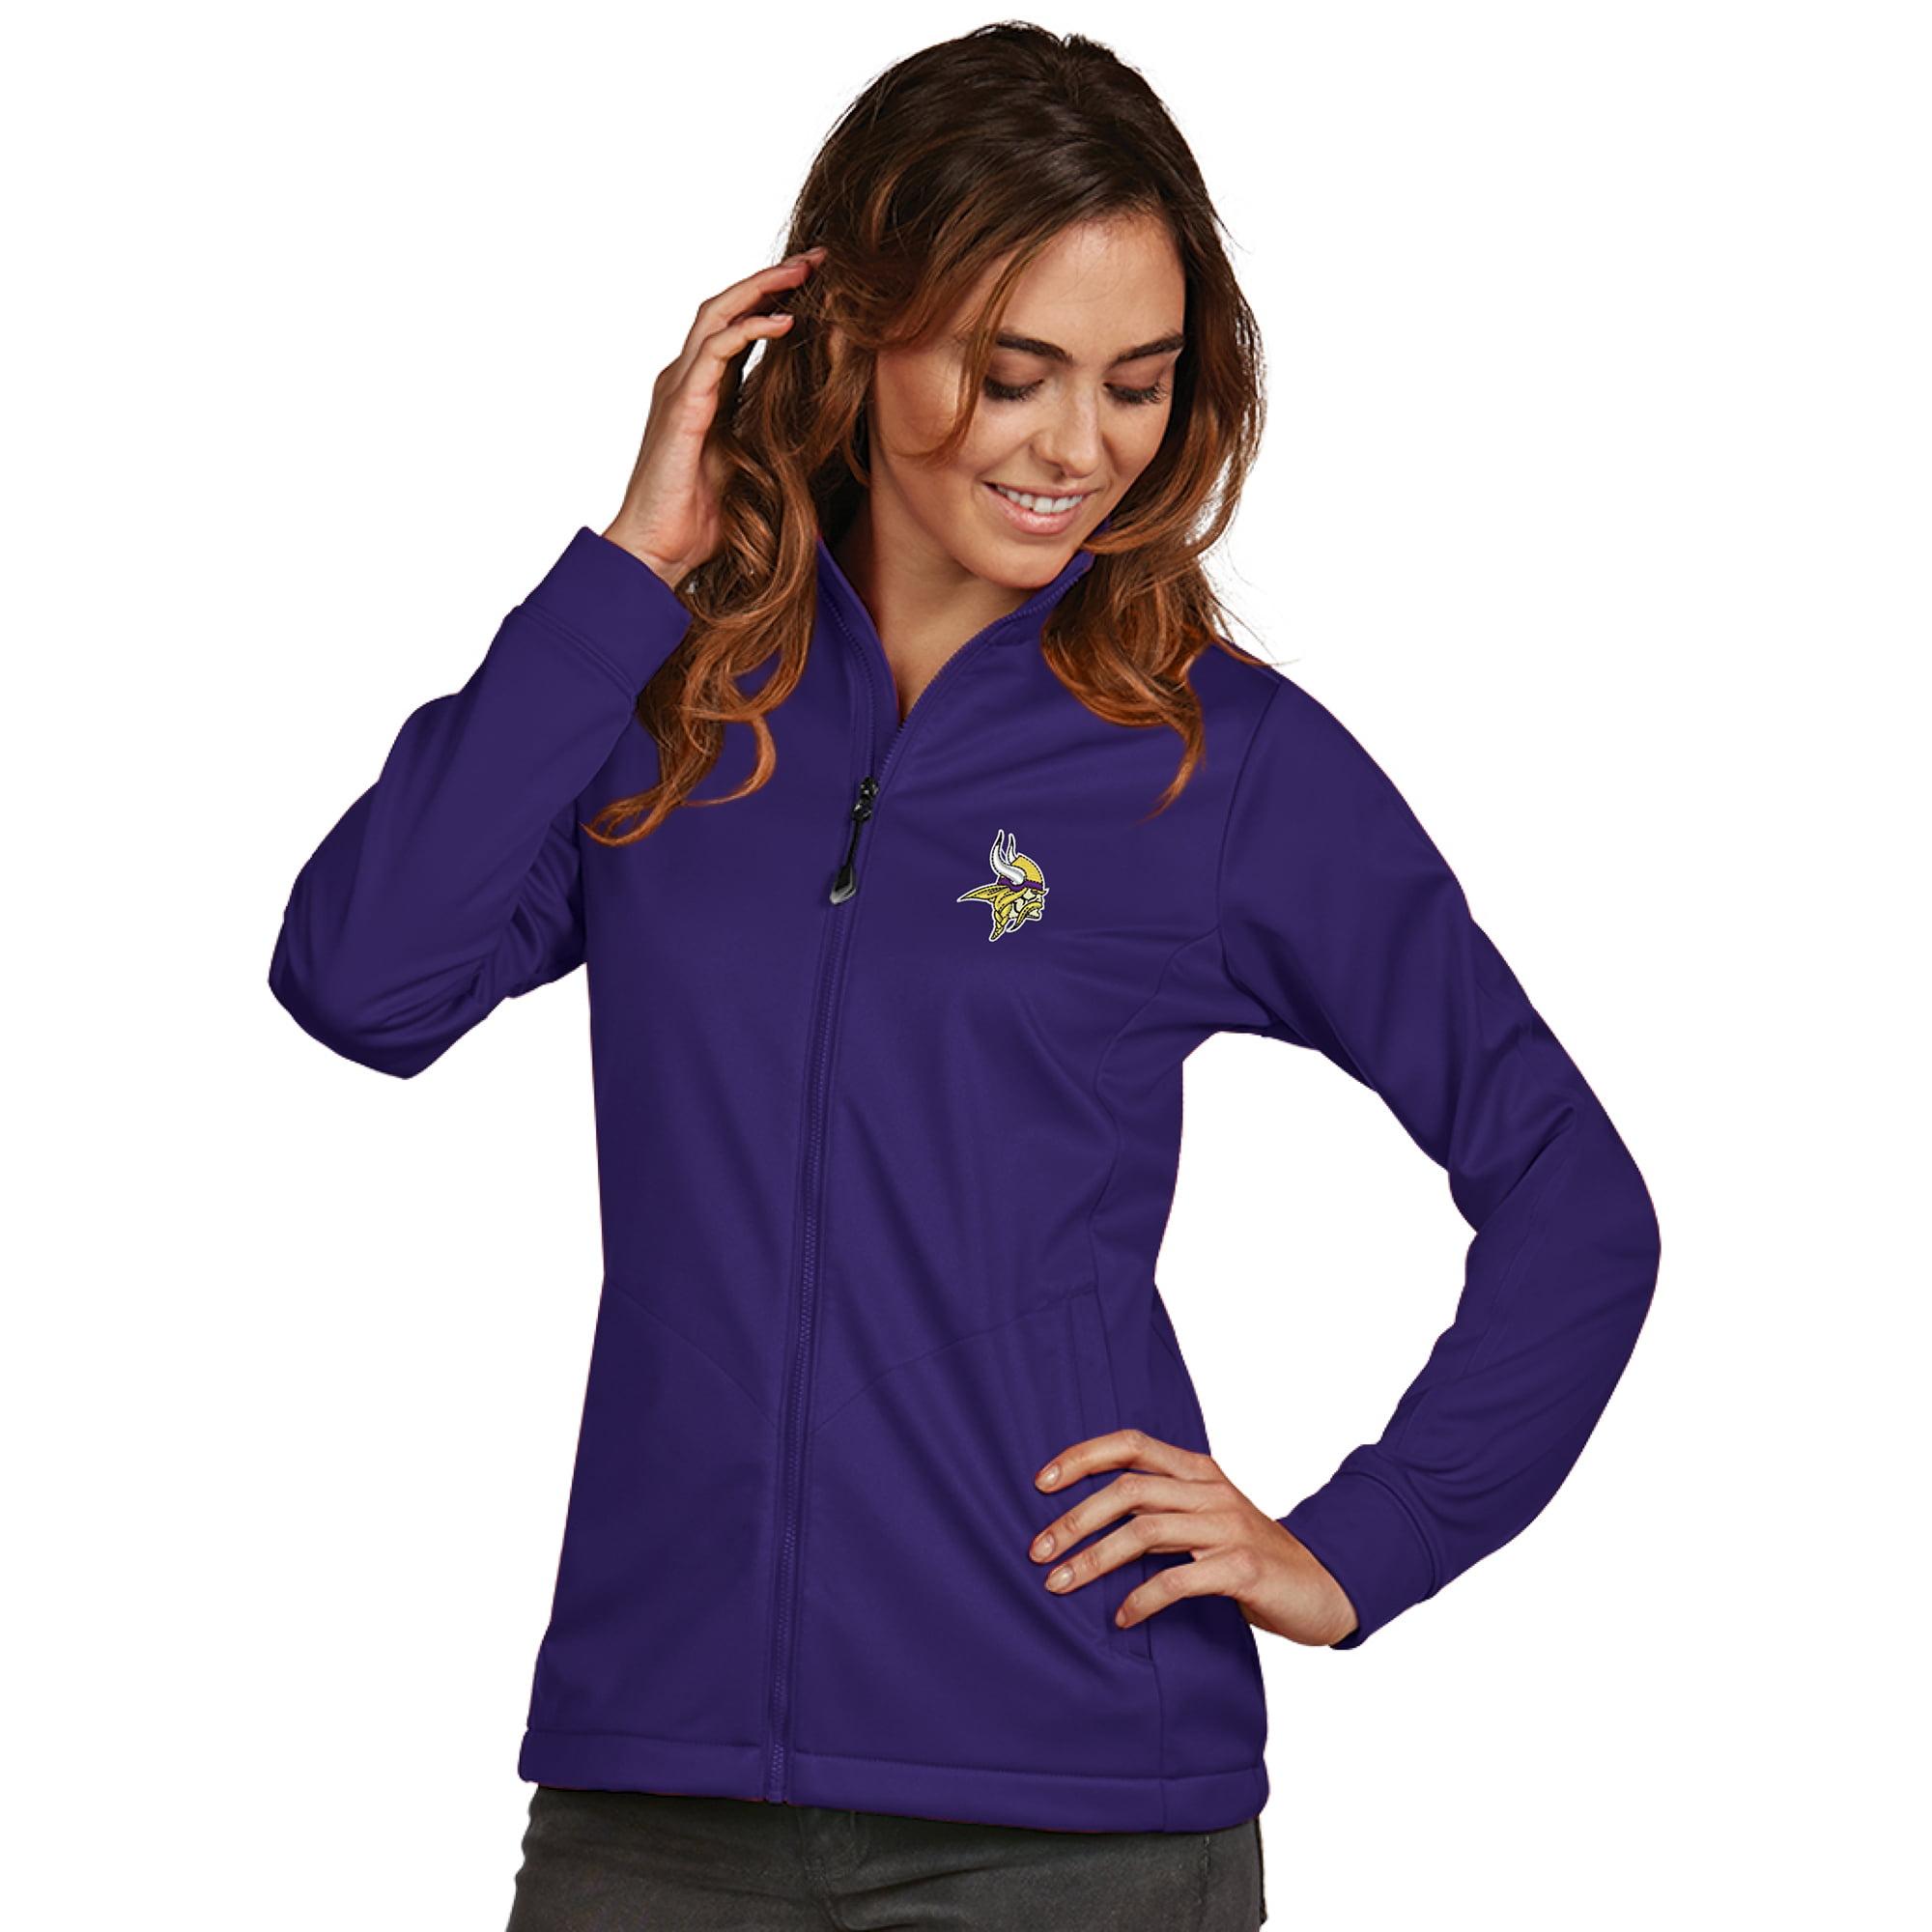 Minnesota Vikings Women's Antigua Full-Zip Golf Jacket - Purple